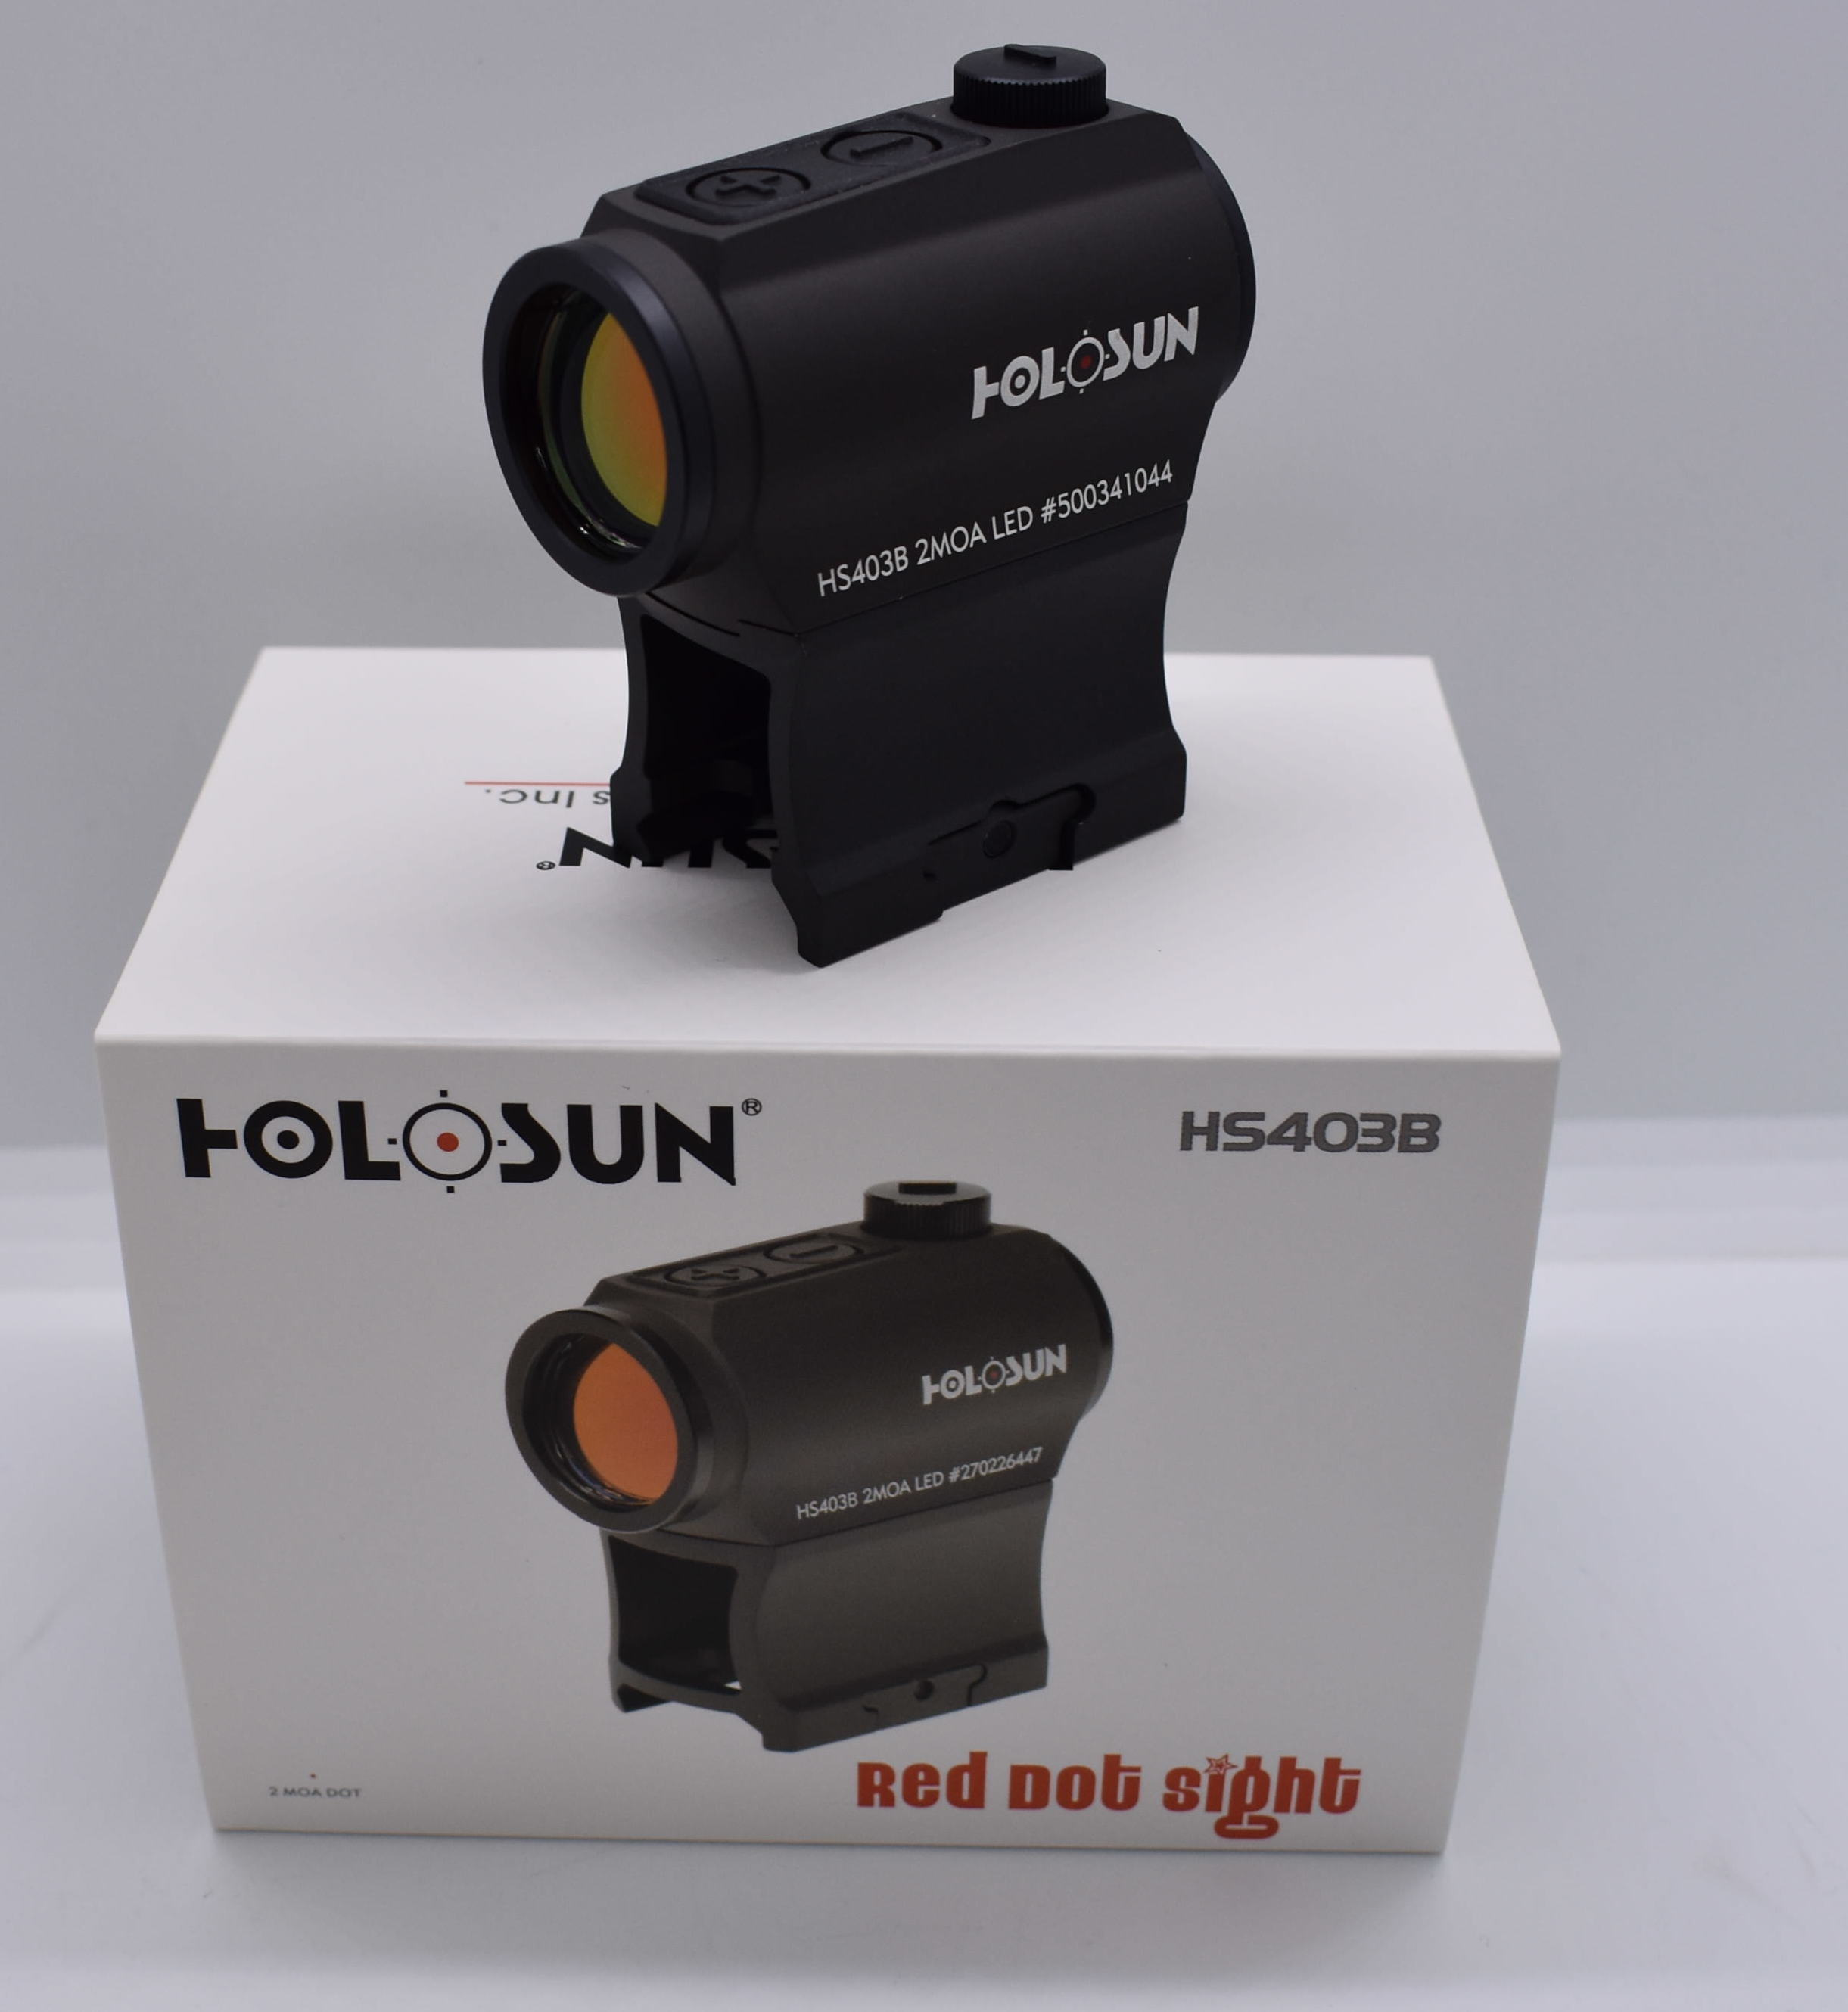 HOLOSUN - HS403B - OPTICS SPORTING EQUIPMENT